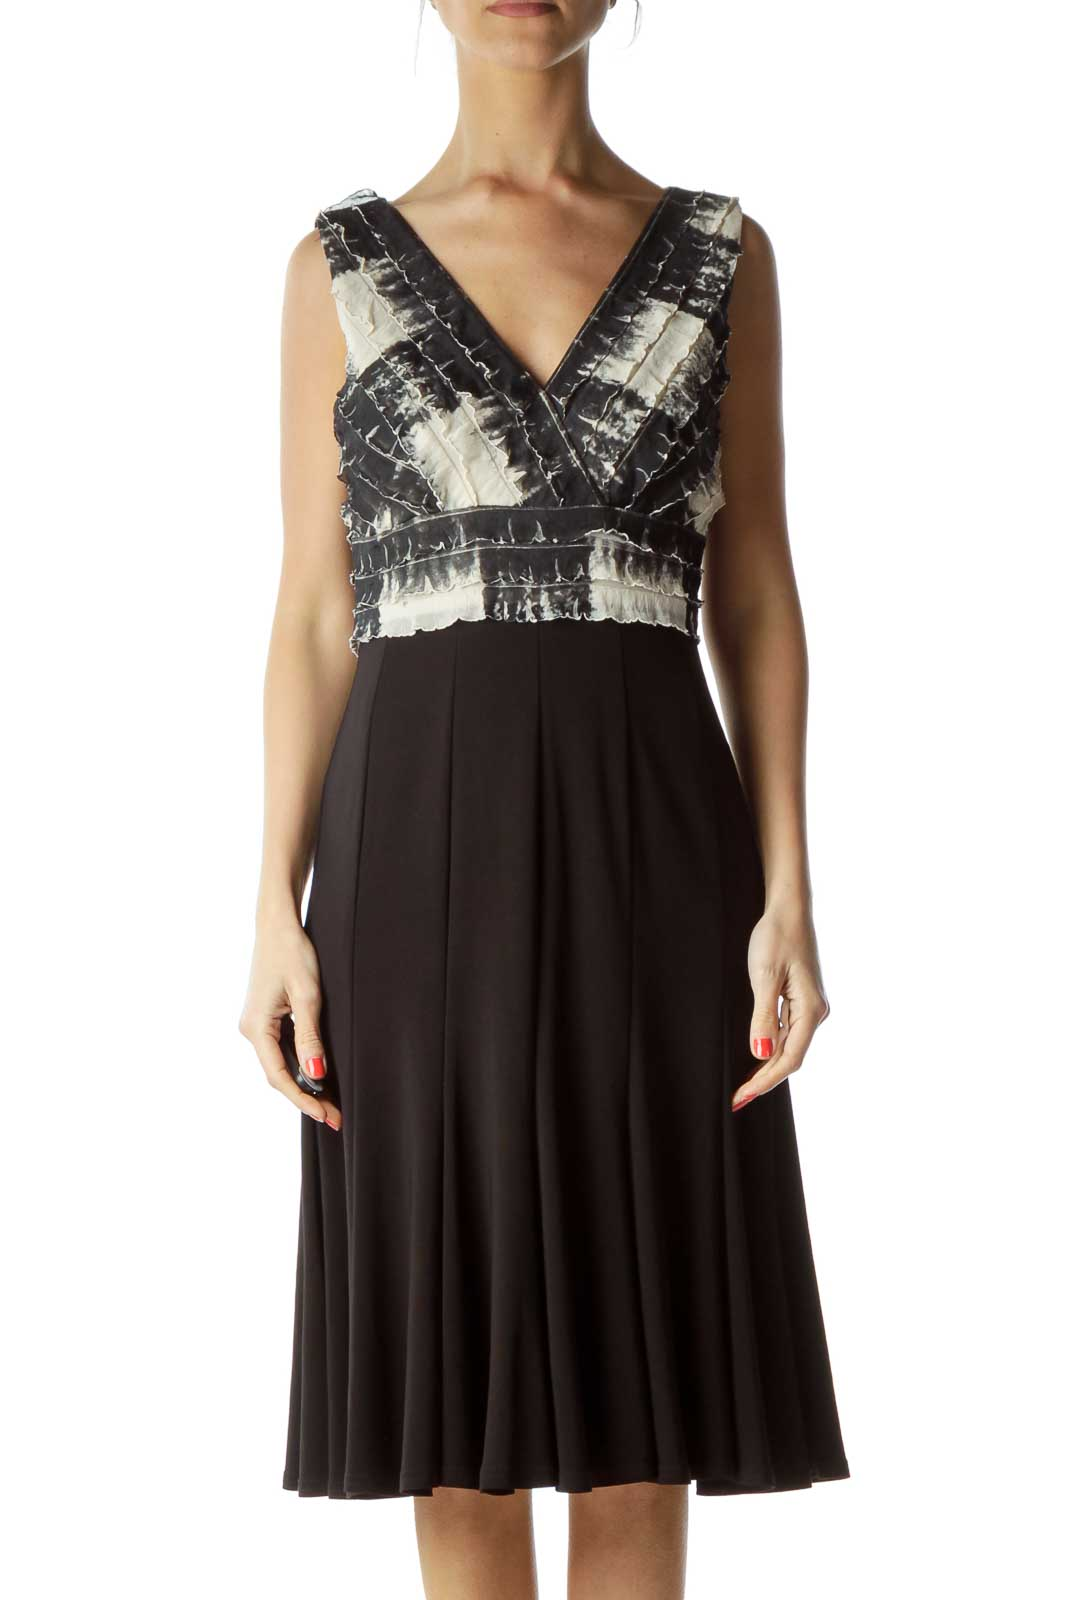 Black Beige Tie Die Pleated Cocktail Dress Front